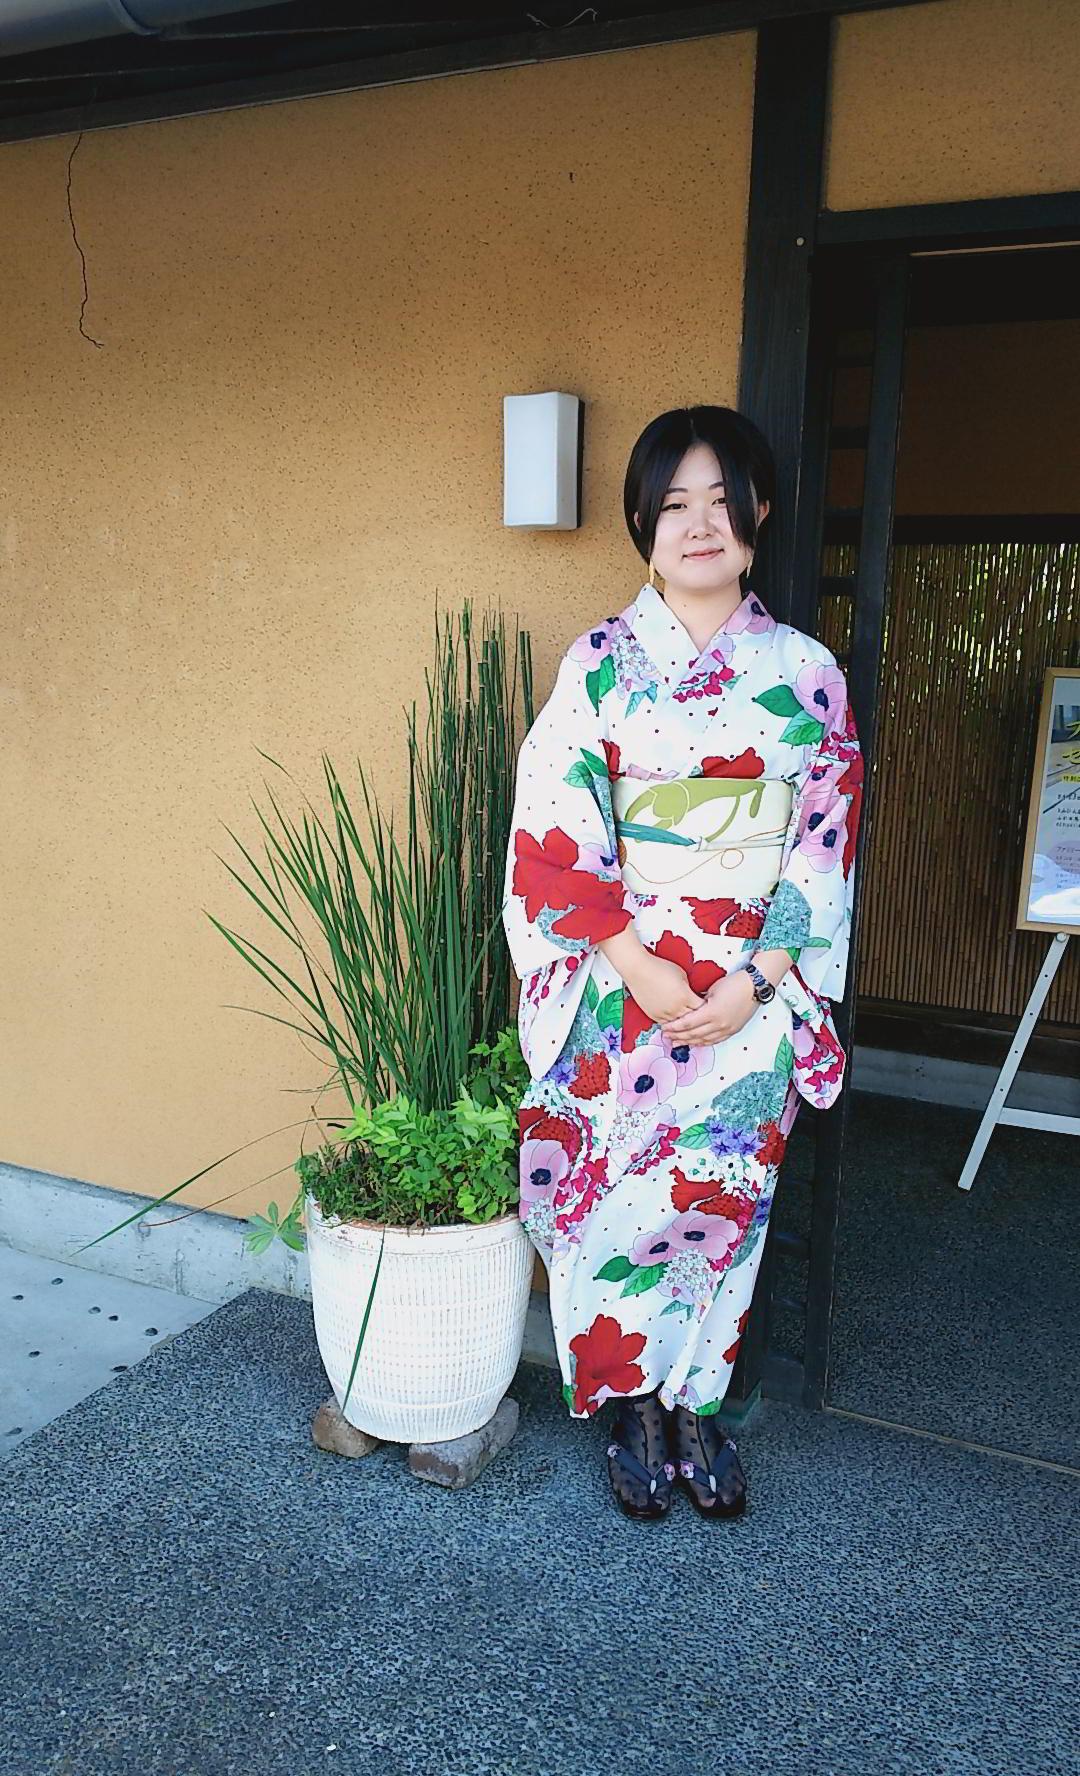 http://www.tomihiro.co.jp/blog/2019/09/05/IMG_20190826_144319239.jpg